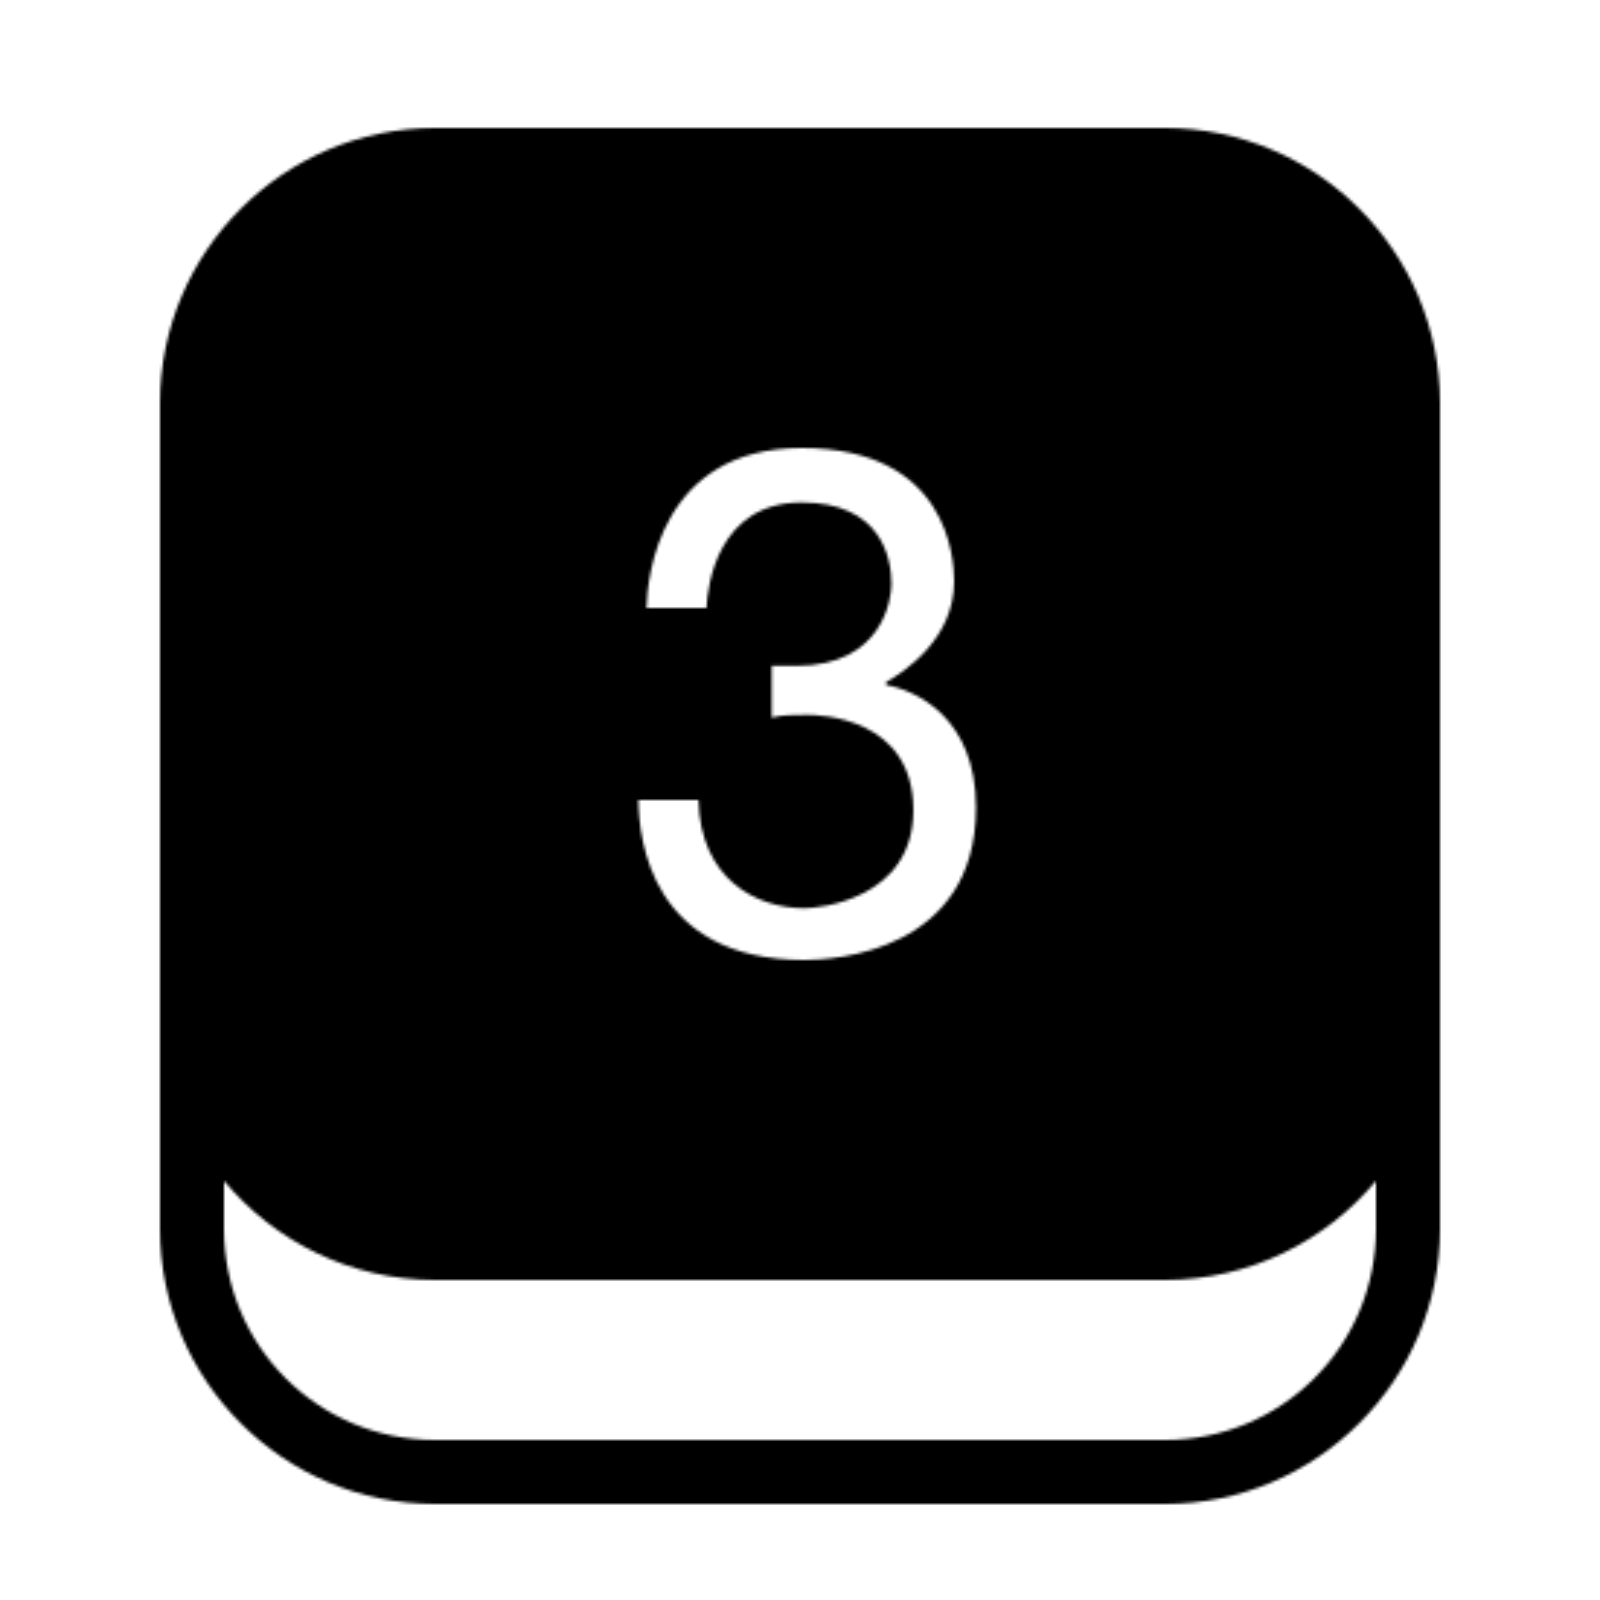 3 Key Filled icon